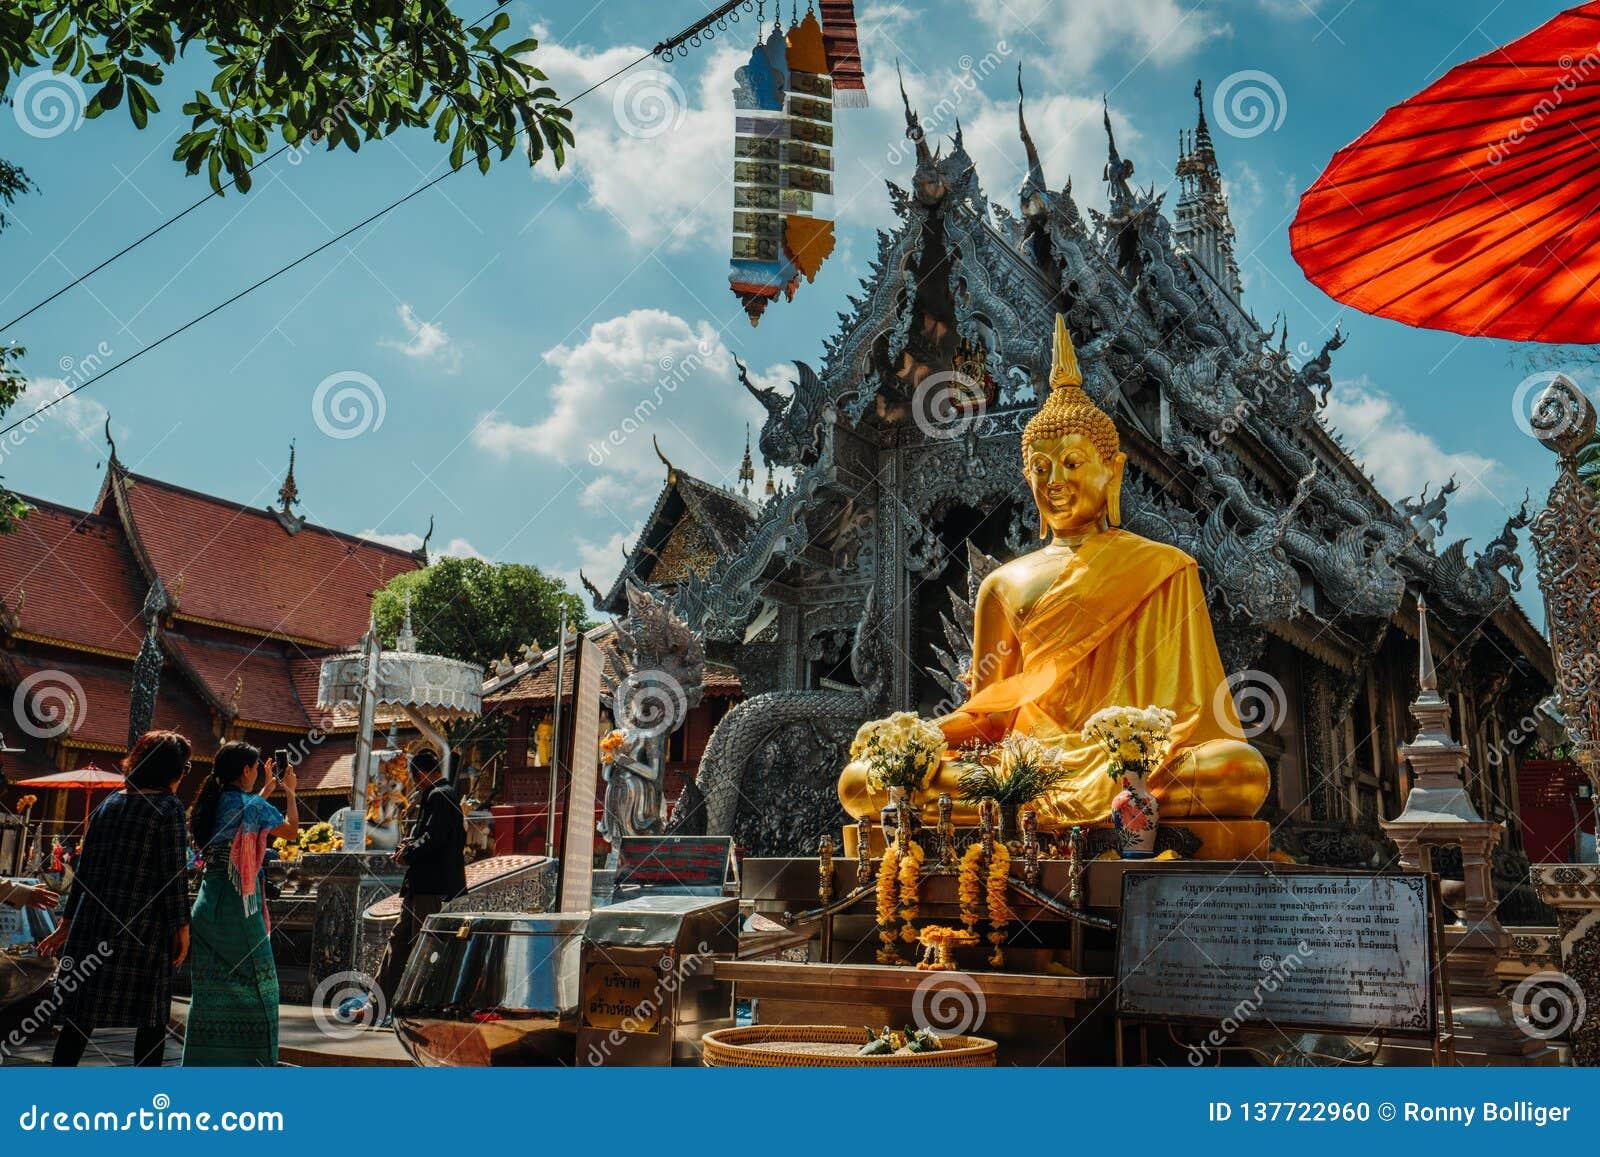 Chiang Mai, Ταϊλάνδη, 12 16 18: Έξω από τον ασημένιο ναό Γωνία που πυροβολείται ευρεία του τοπίου Χρυσές και ασημένιες διακοσμήσε